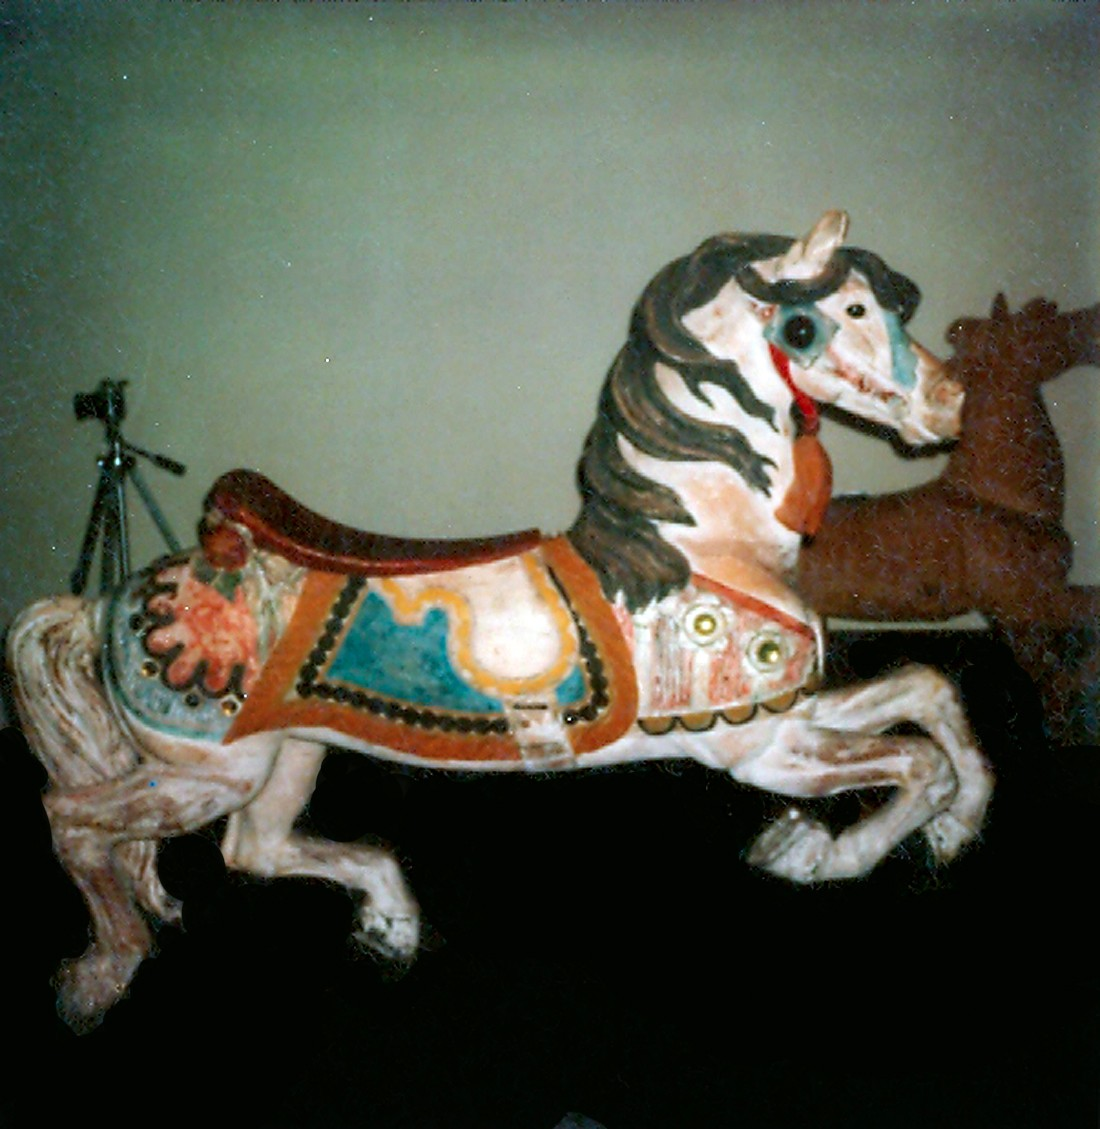 Fraley-Redbug-Carousel-restoration-studio-1980